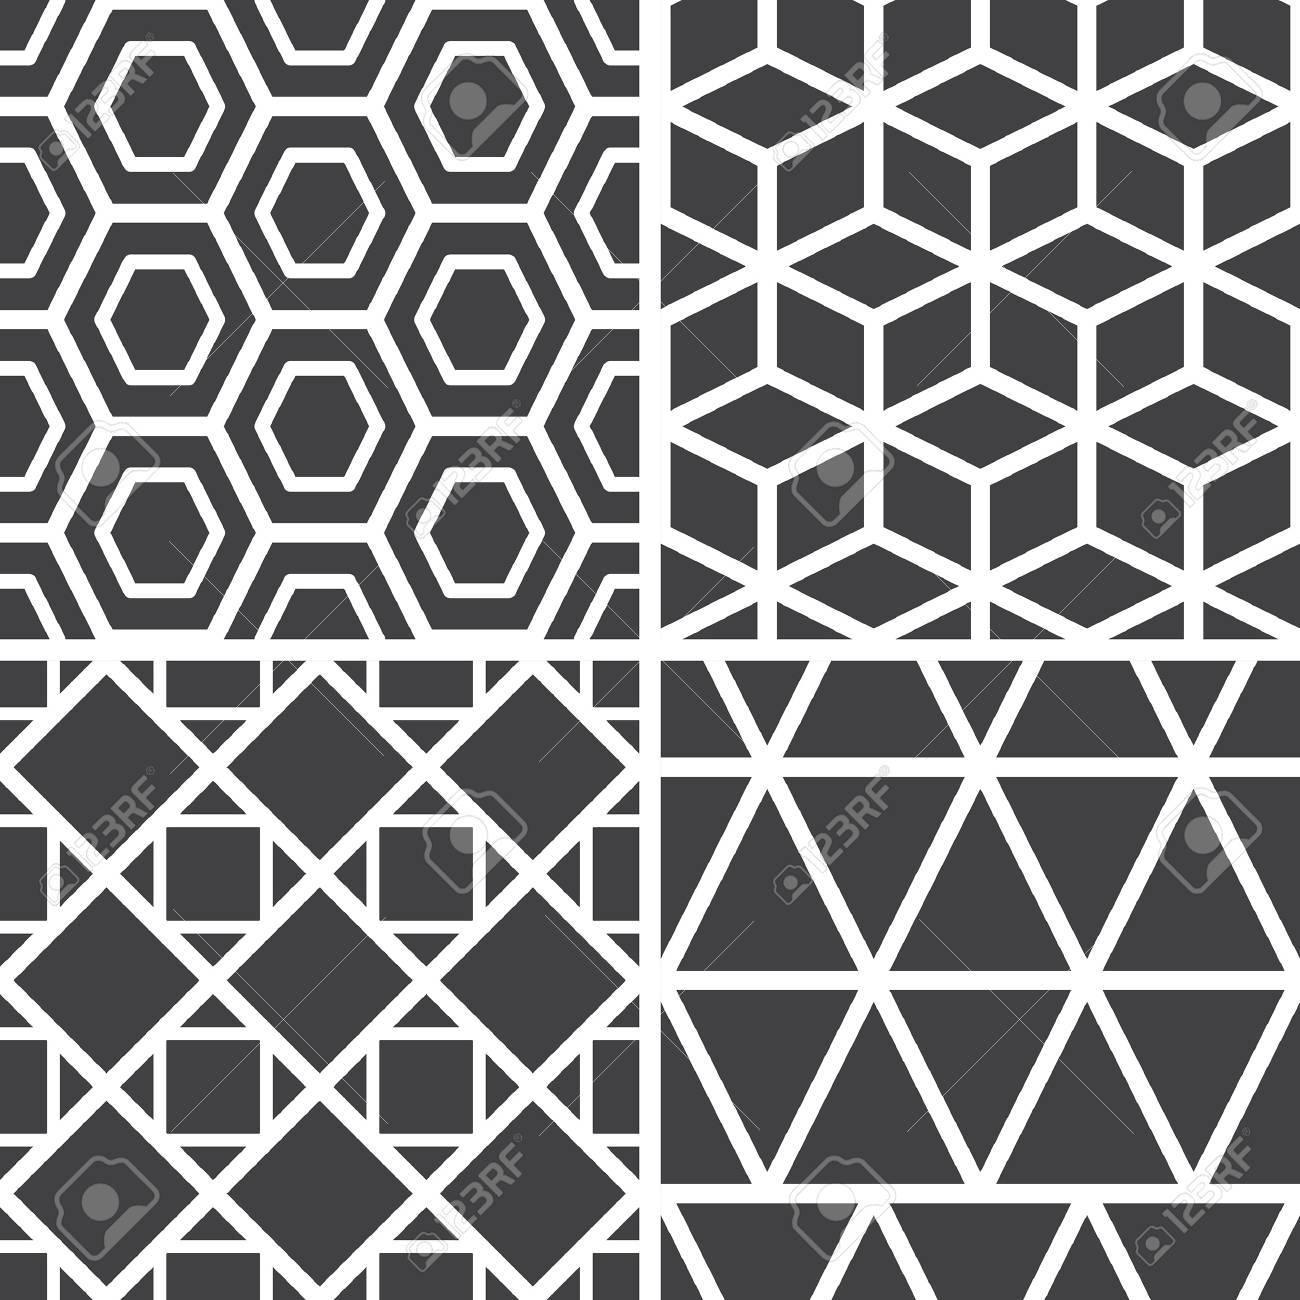 Disegni Geometrici Bianco E Nero serie di semplici motivi geometrici senza soluzione di continuità in bianco  e nero vettore. poligoni, cubi, quadrati, triangoli. in bianco e nero